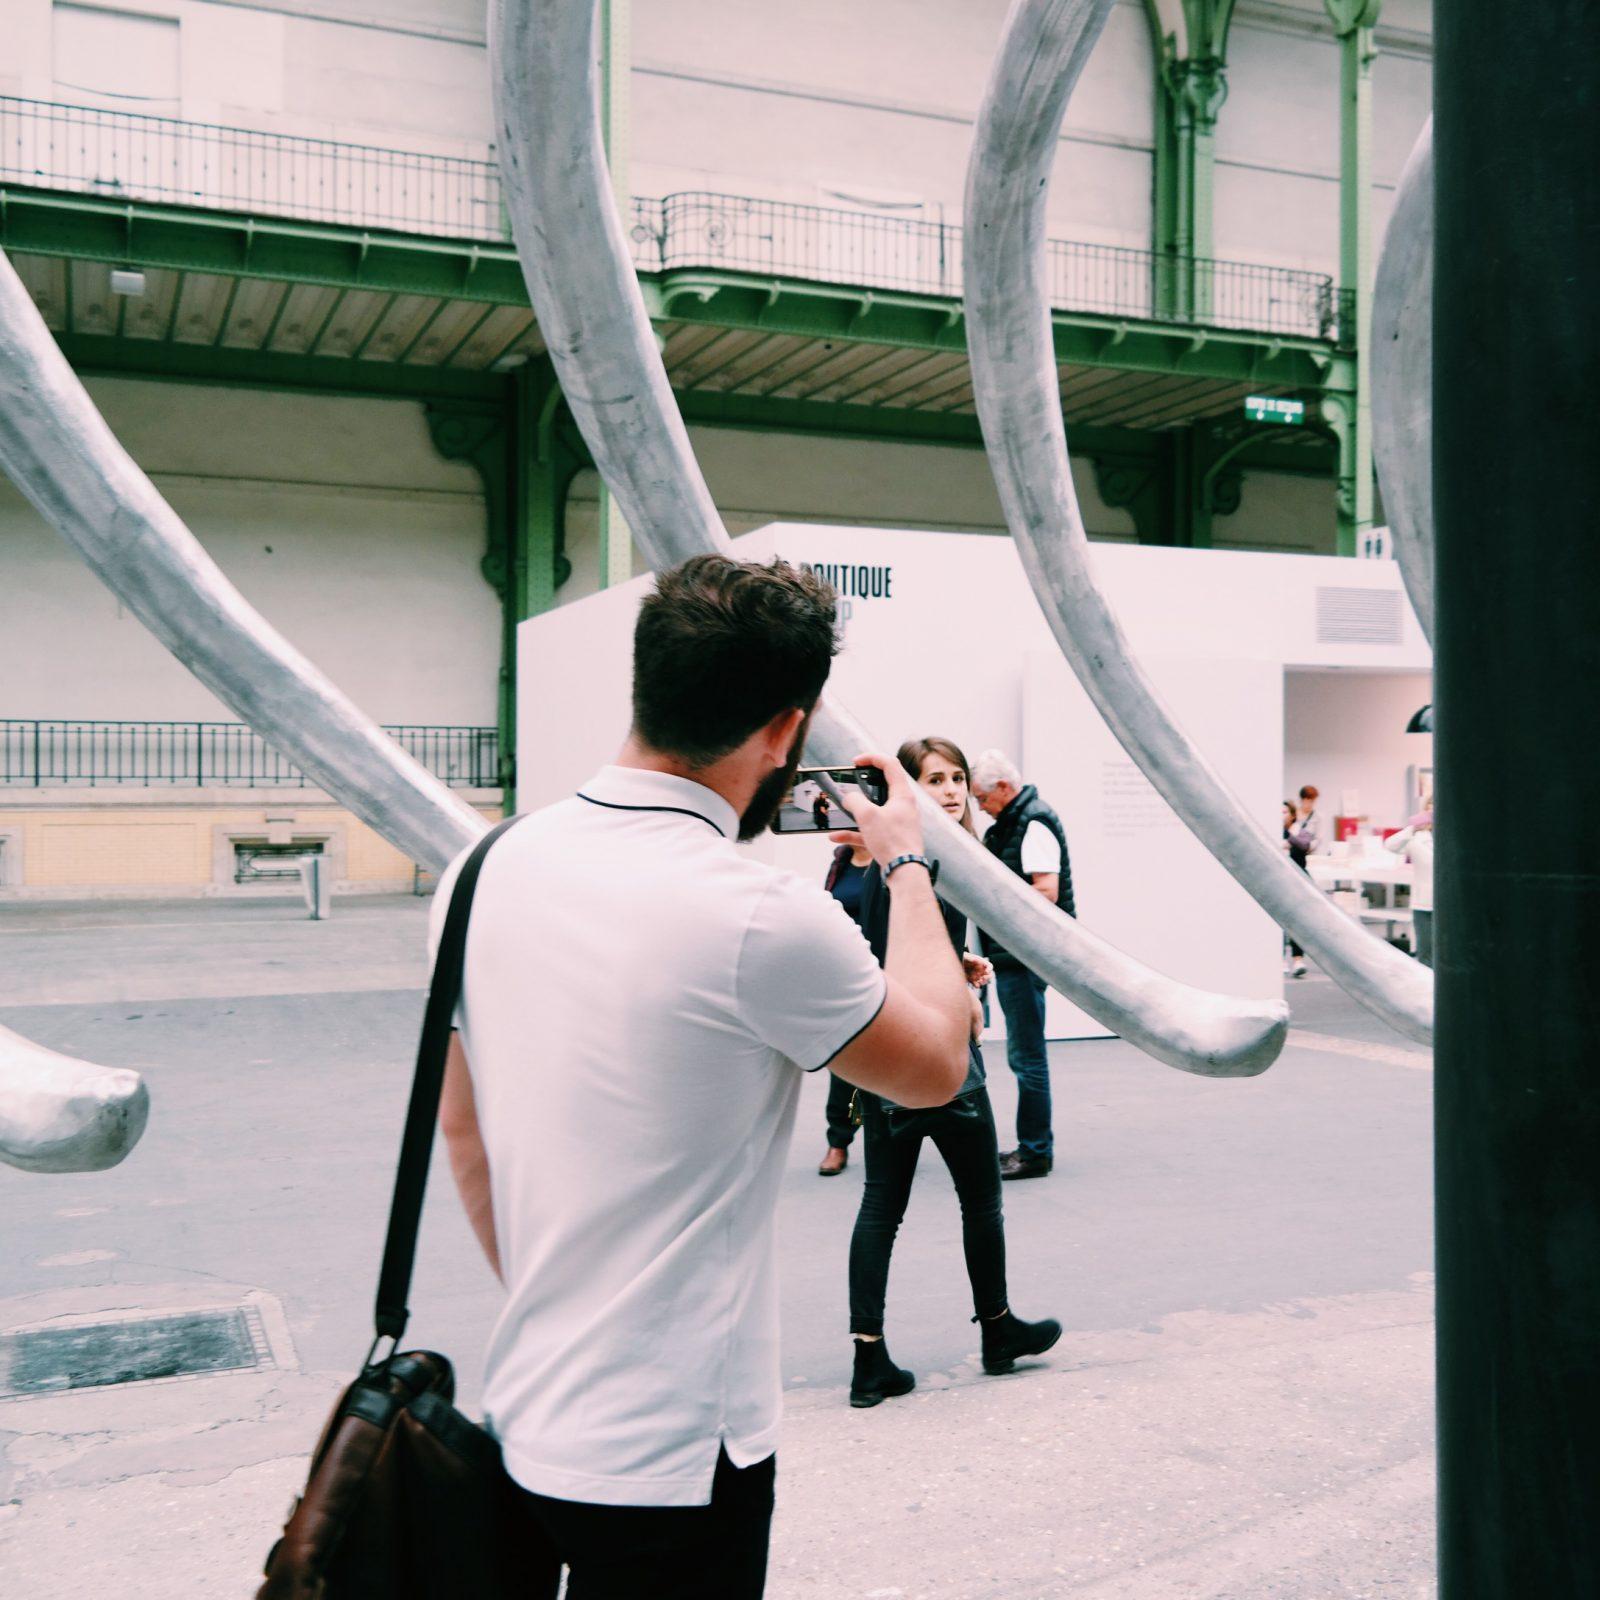 Monumenta-2016-Empires-Huang-Yong-Ping-Grand-Palais-Paris-visiteurs-visitors-Nef-Kamel-Mennour-photo-usofparis-blog